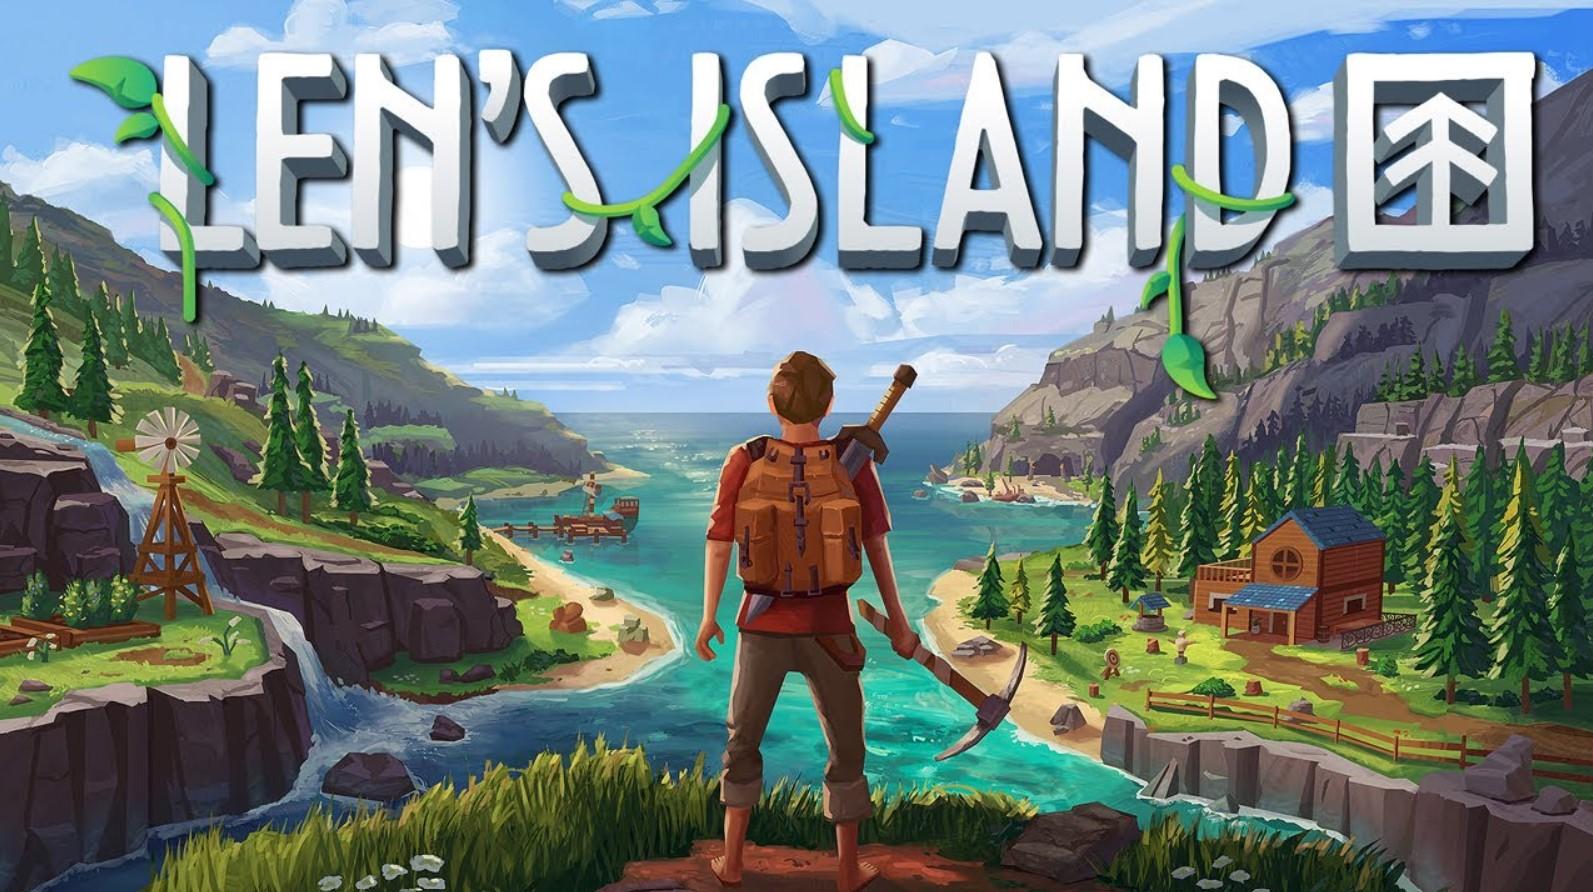 Lens Island Nintendo Switch Version Full Setup Game Free Download